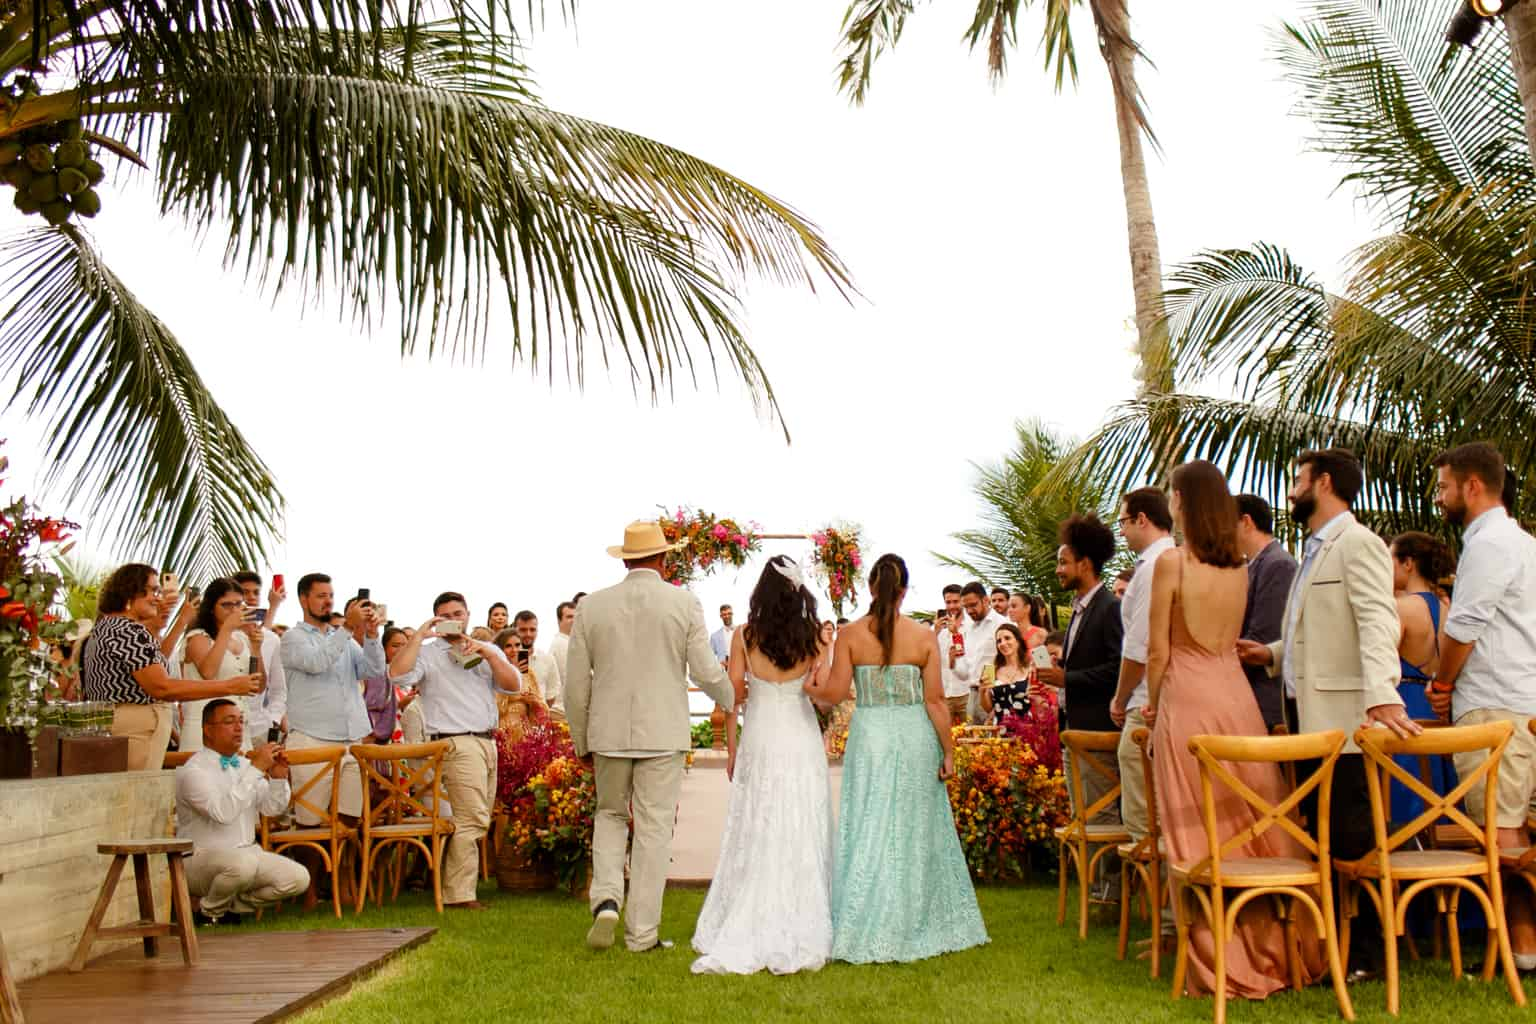 Casamento-Emanuelle-e-Alysson-Fotografia-Tadeu-Nanó-e-Luca-Antunes75